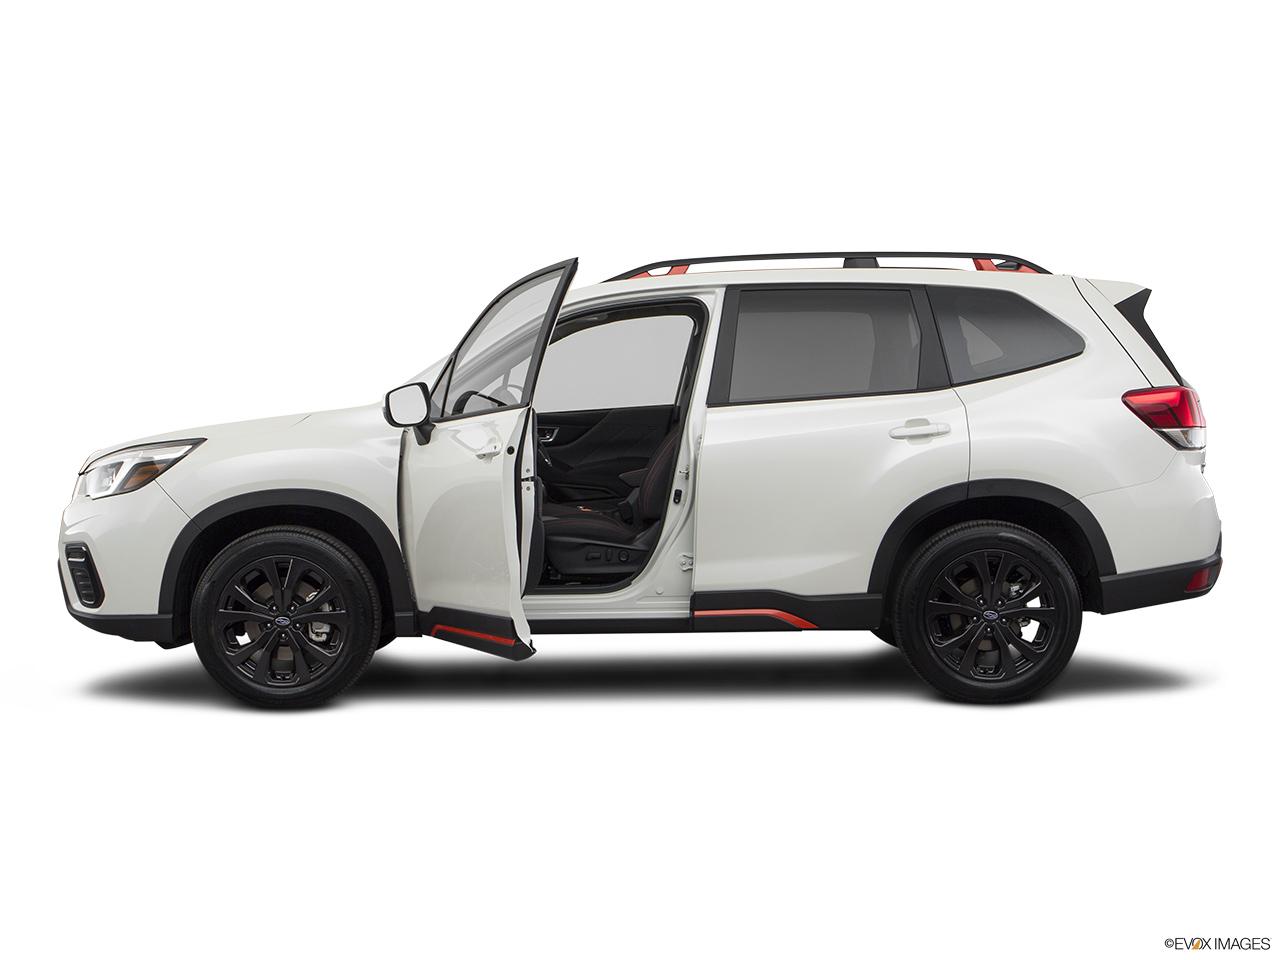 car features list for subaru forester 2020 2 5i sport  uae